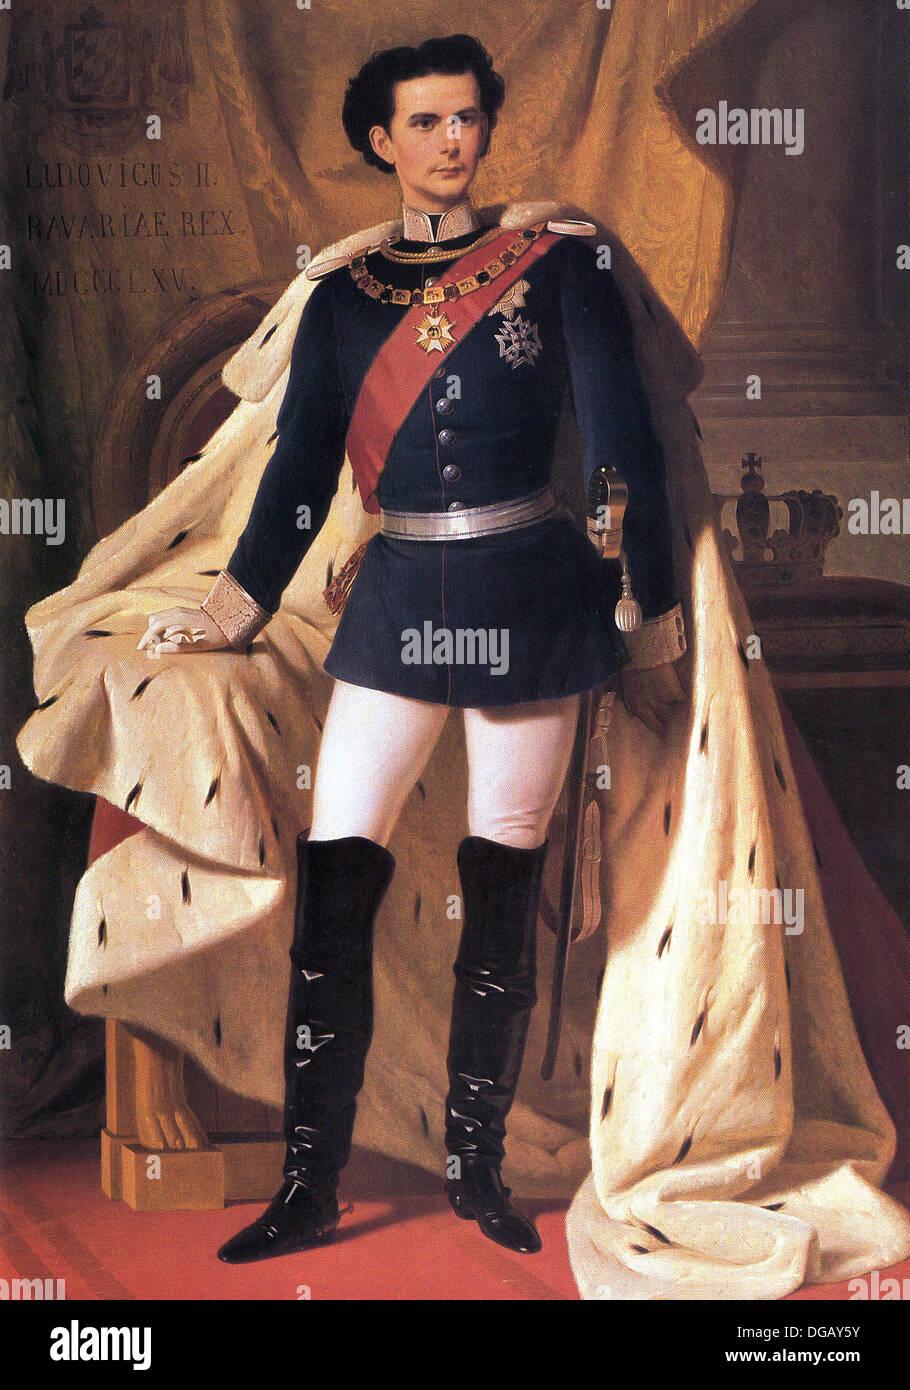 King Ludwig II of Bavaria in generals' uniform and coronation robe - Stock Image